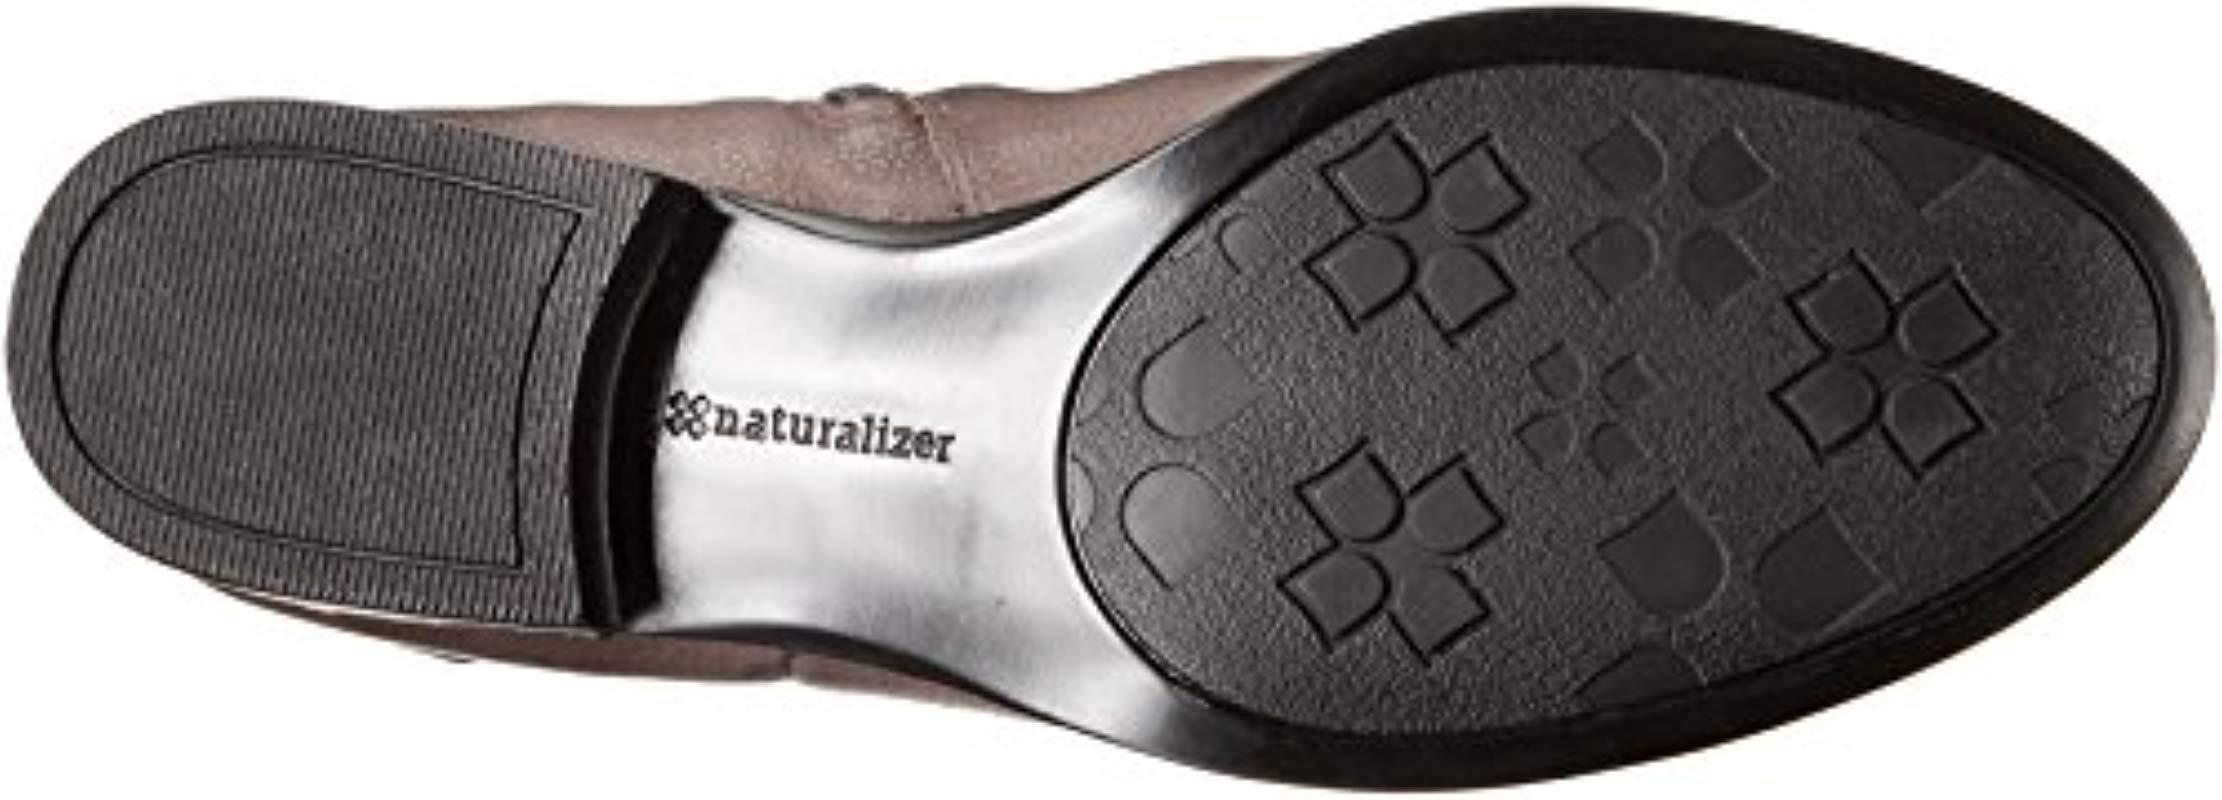 eac06b8caed Naturalizer - Gray Joan Wide Calf Riding Boot - Lyst. View fullscreen